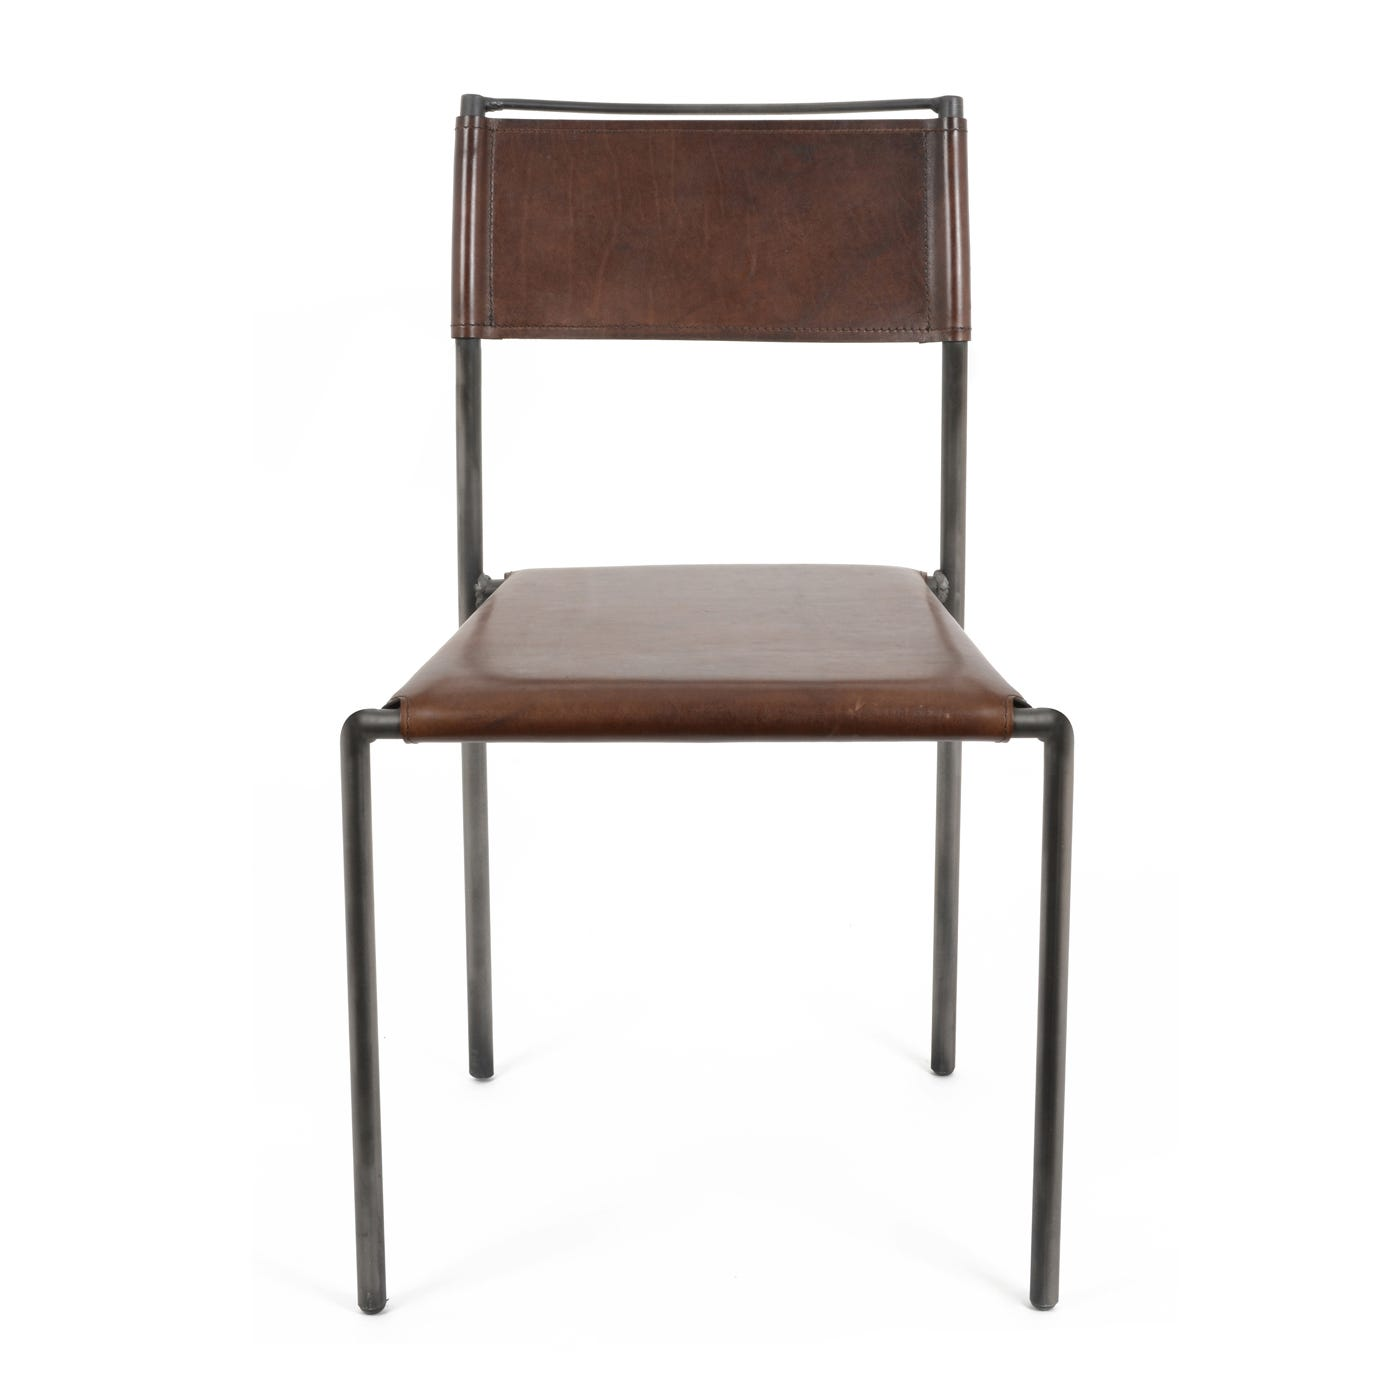 Heal's Ferra Side Chair Buffalo Leather Dark Brown